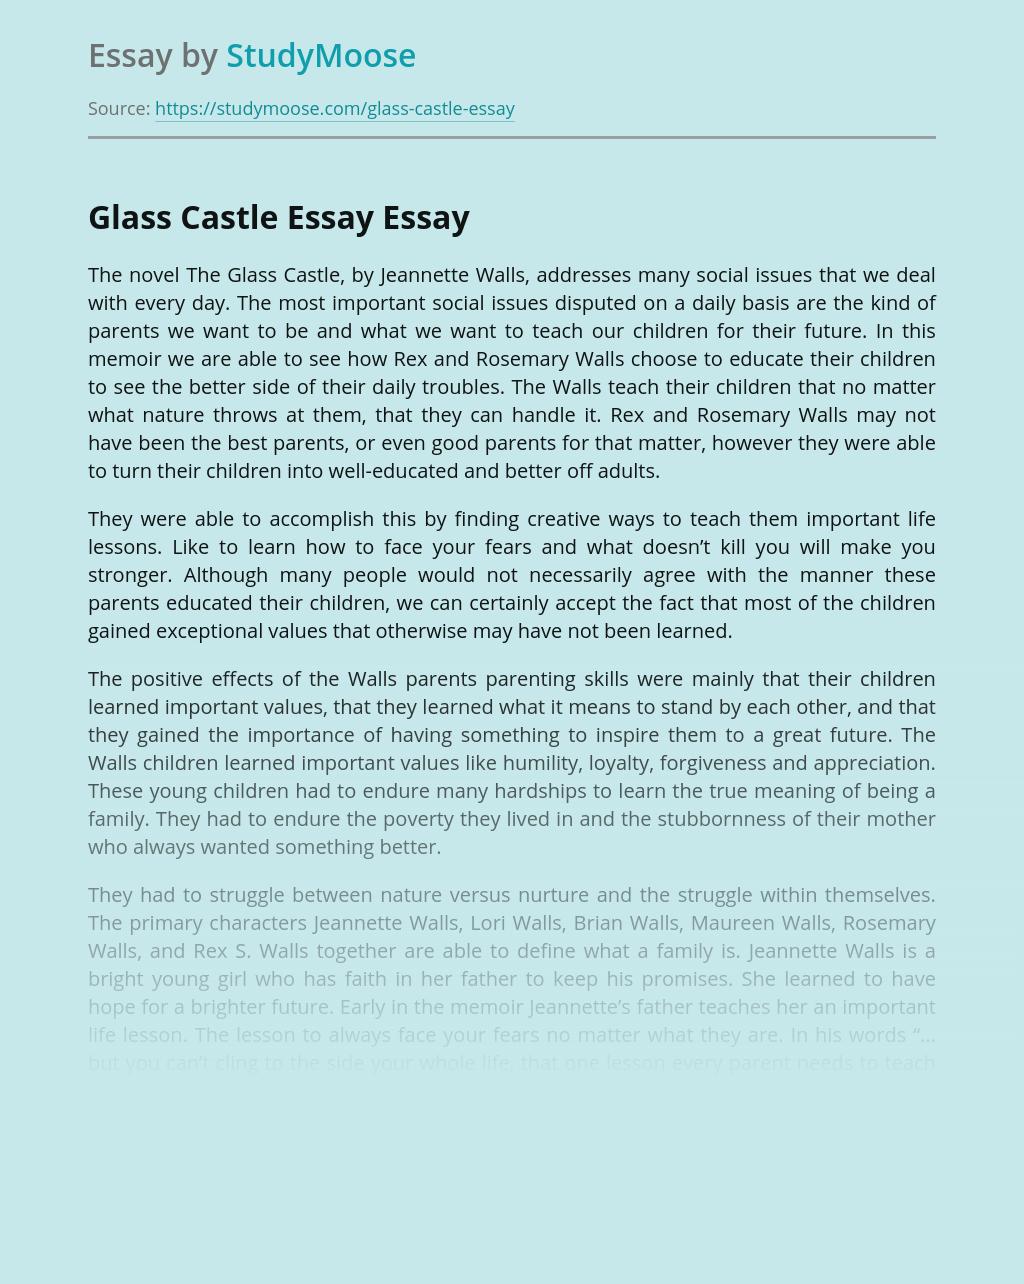 Glass Castle Essay